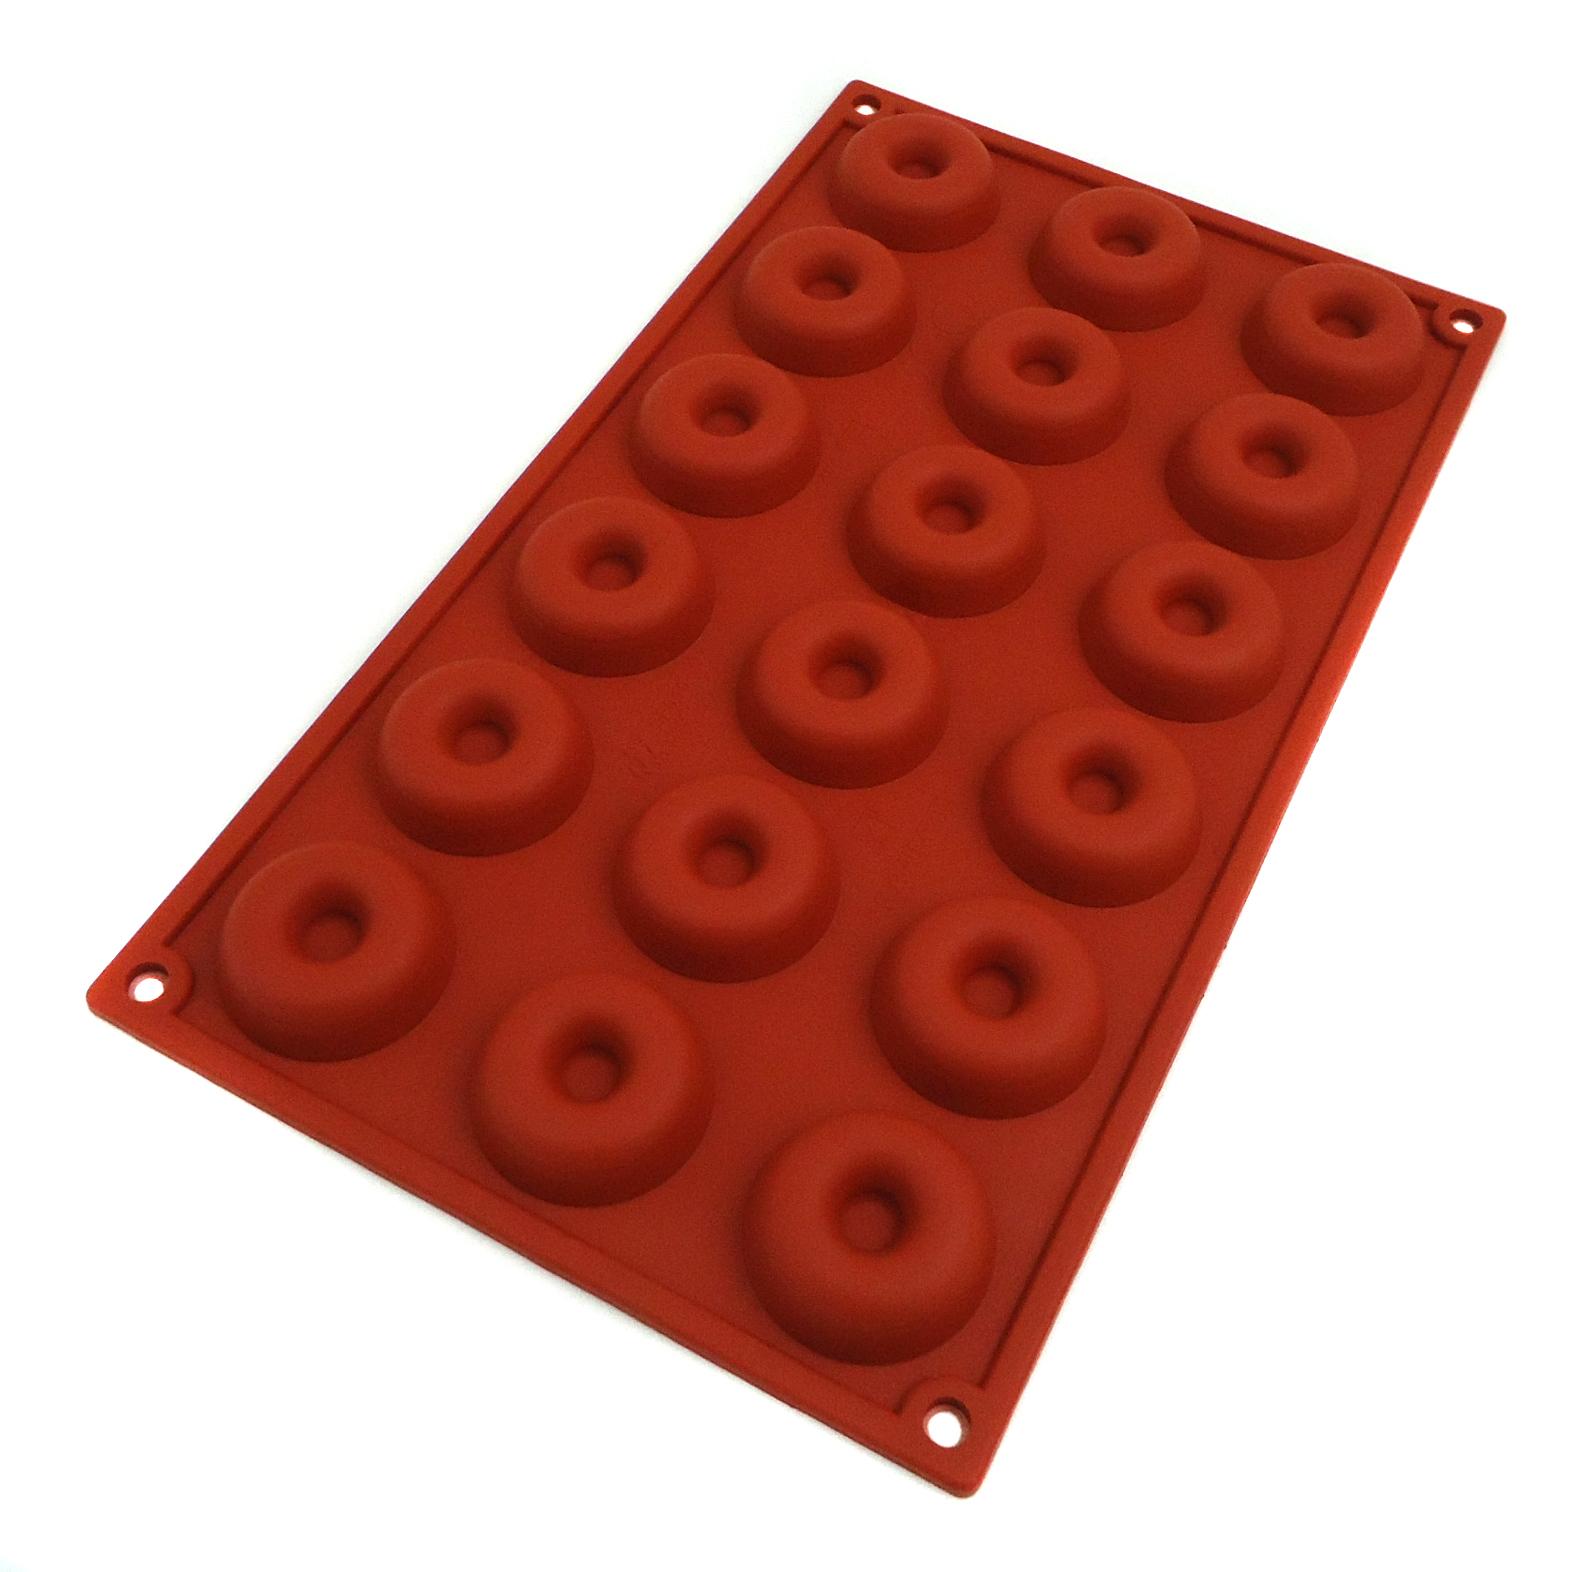 Lacor 66808 Αντικολλητικές Φόρμες Σιλικόνης Mini Savarin 18 Θέσεων Ø41x12mm επαγγελματικός εξοπλισμός   επαγγελματικά σκεύη είδη σερβιρίσματος   εξαρτήματα